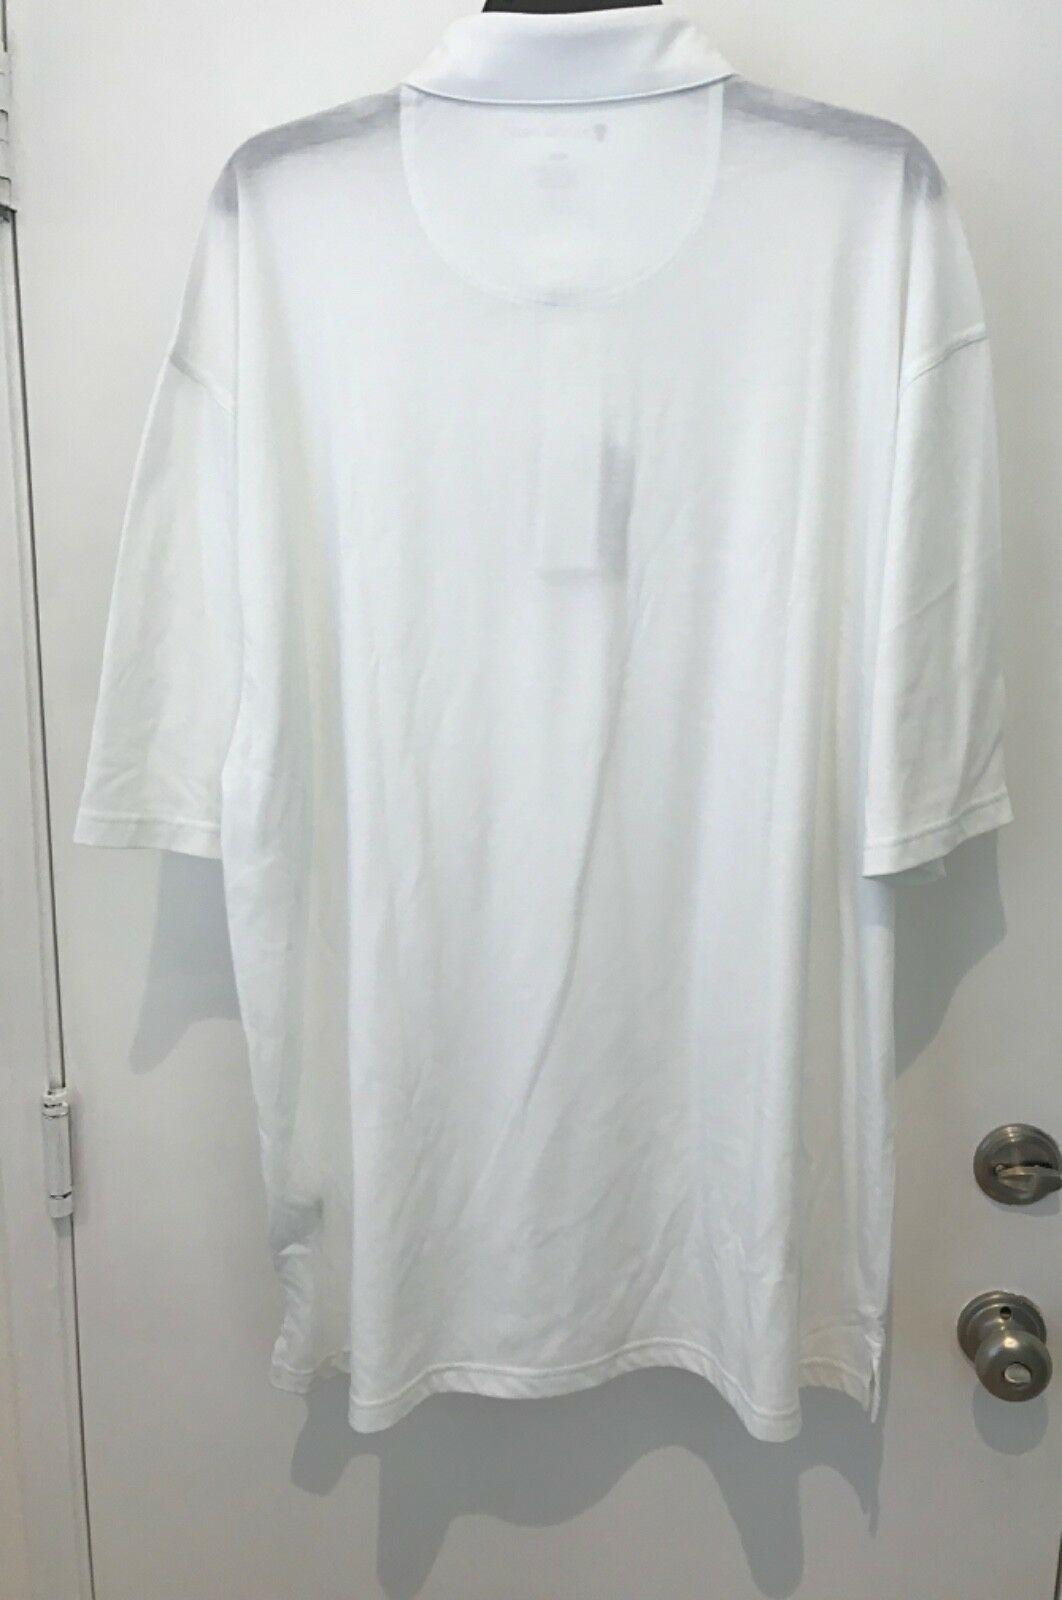 Oxford Golf Super Dry Cool Max Mens XXXL white Short Sleeve Polo Shirt NWT